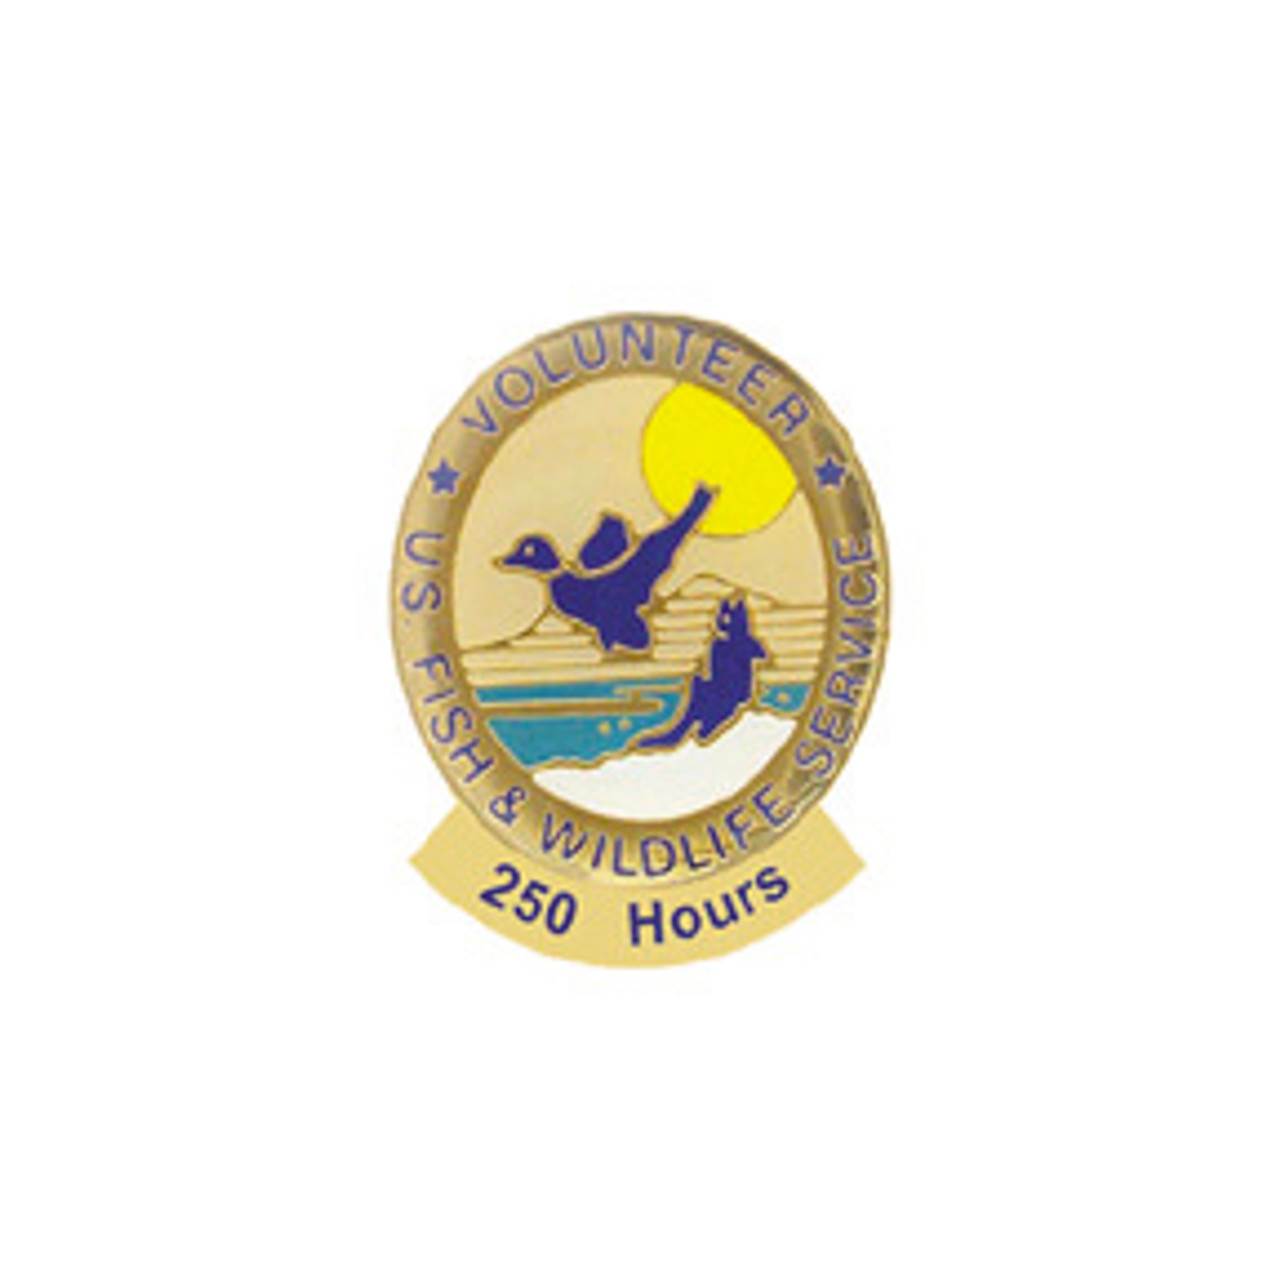 Fish & Wildlife Volunteer Hours Pin (1500 hours)